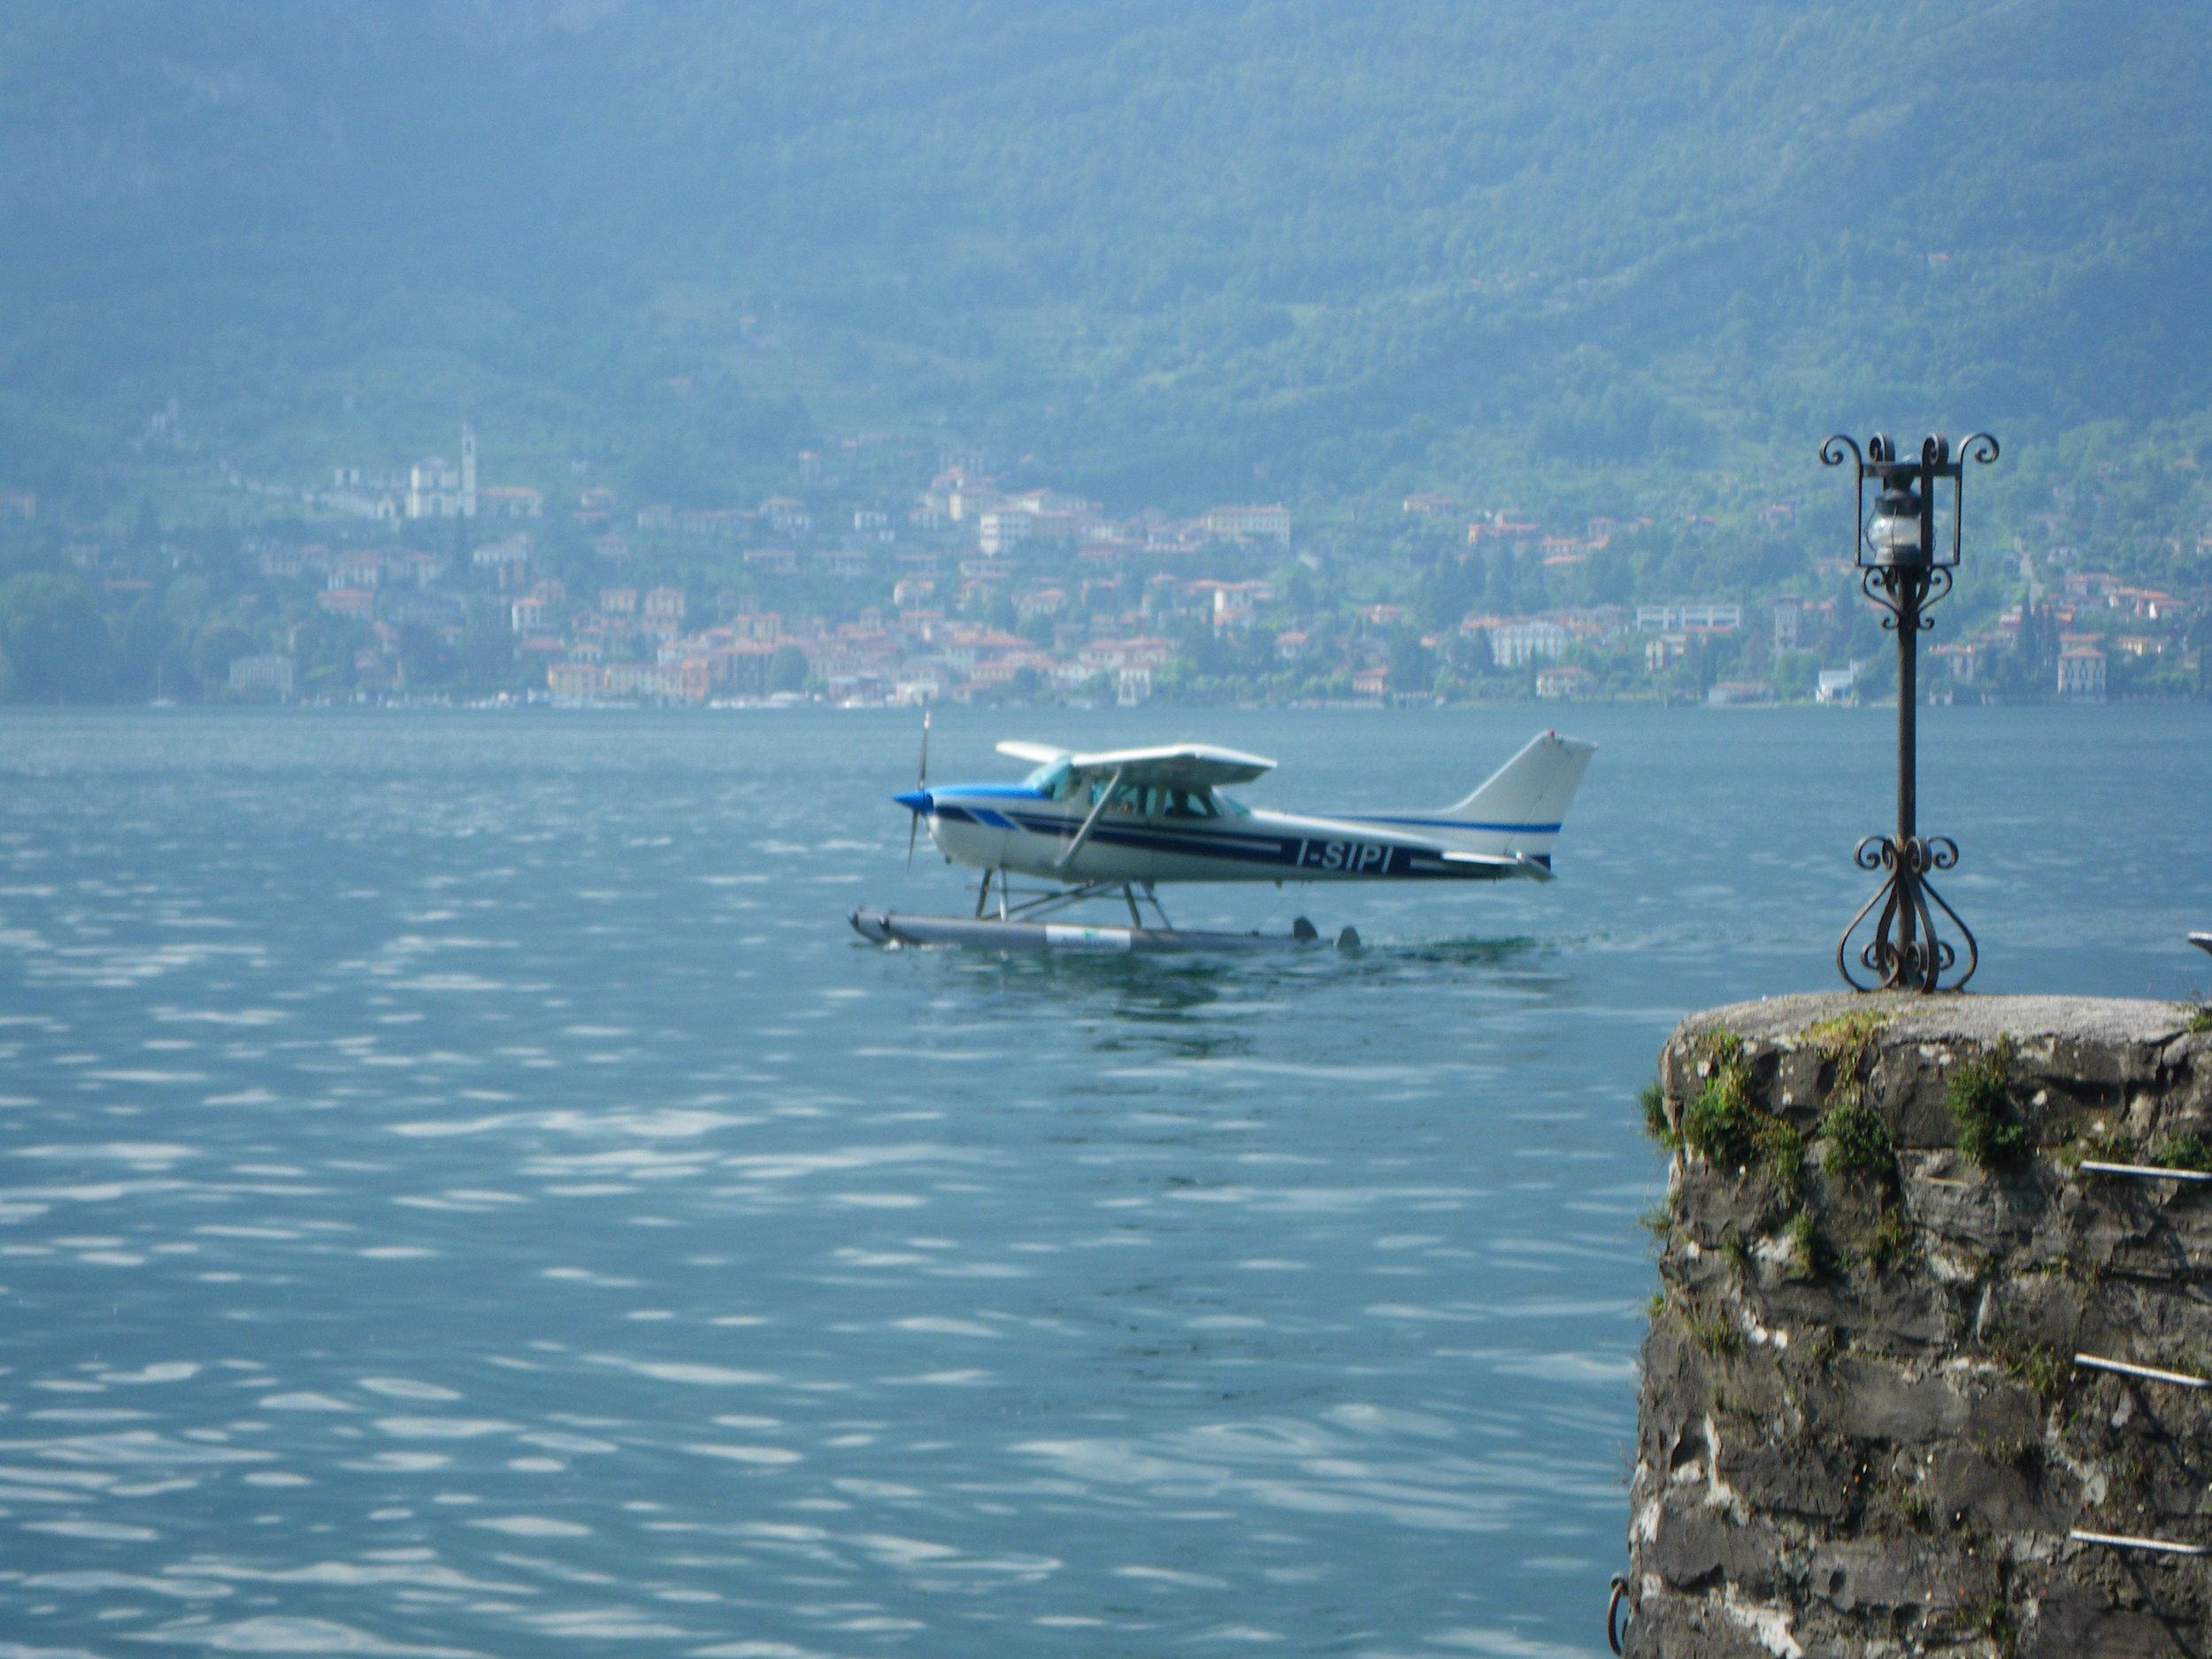 Private seaplane transfers are sometimes available through http://www.aeroclubcomo.com/